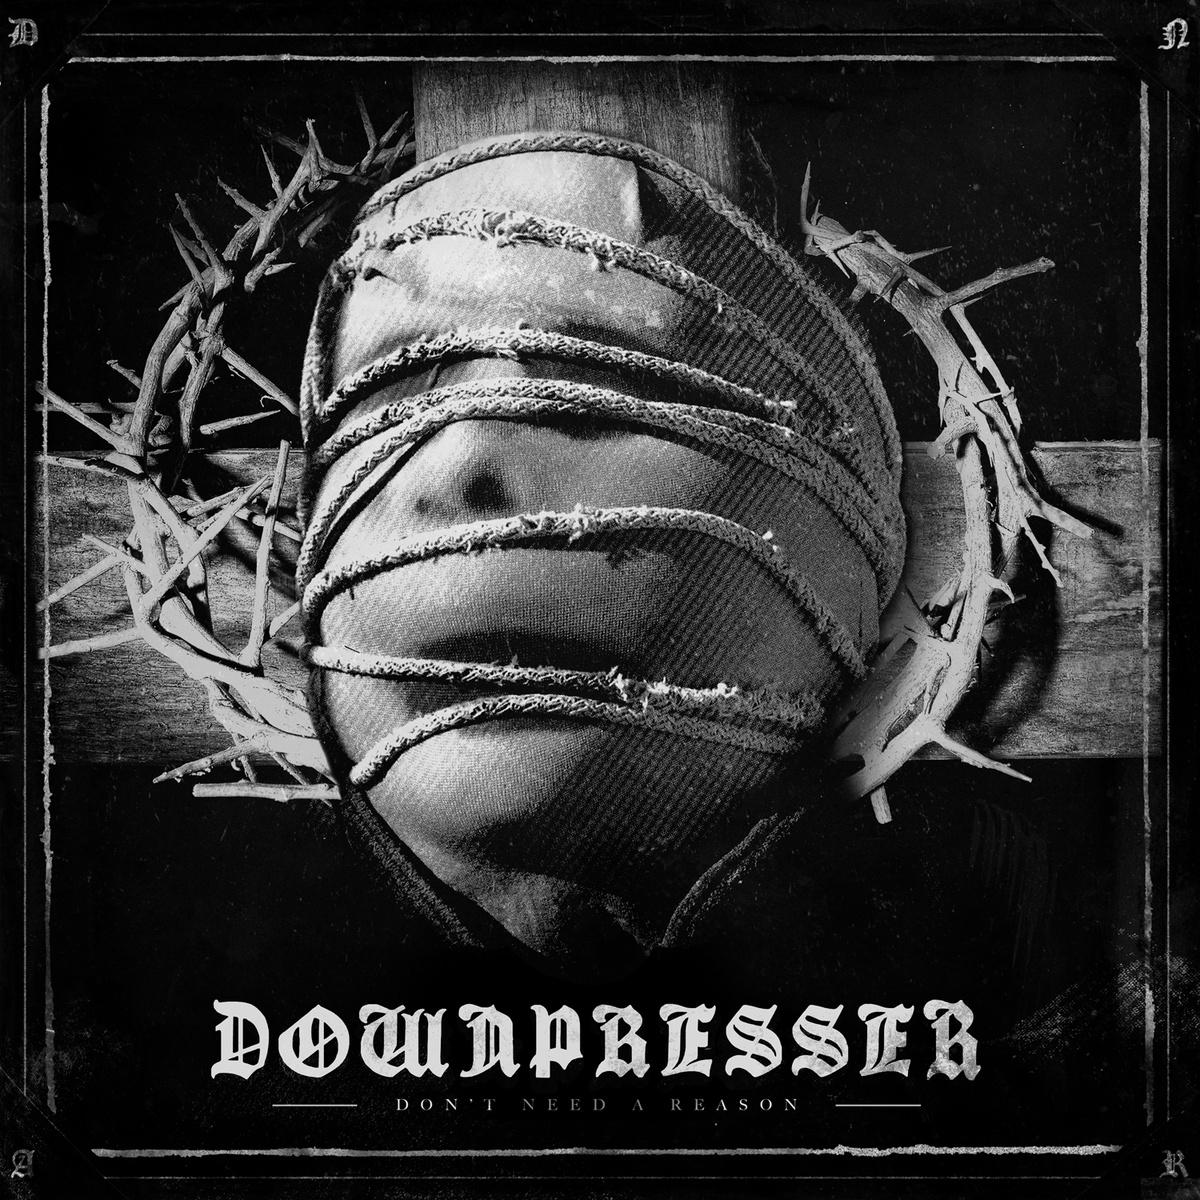 Downpresser – Don't Need A Reason